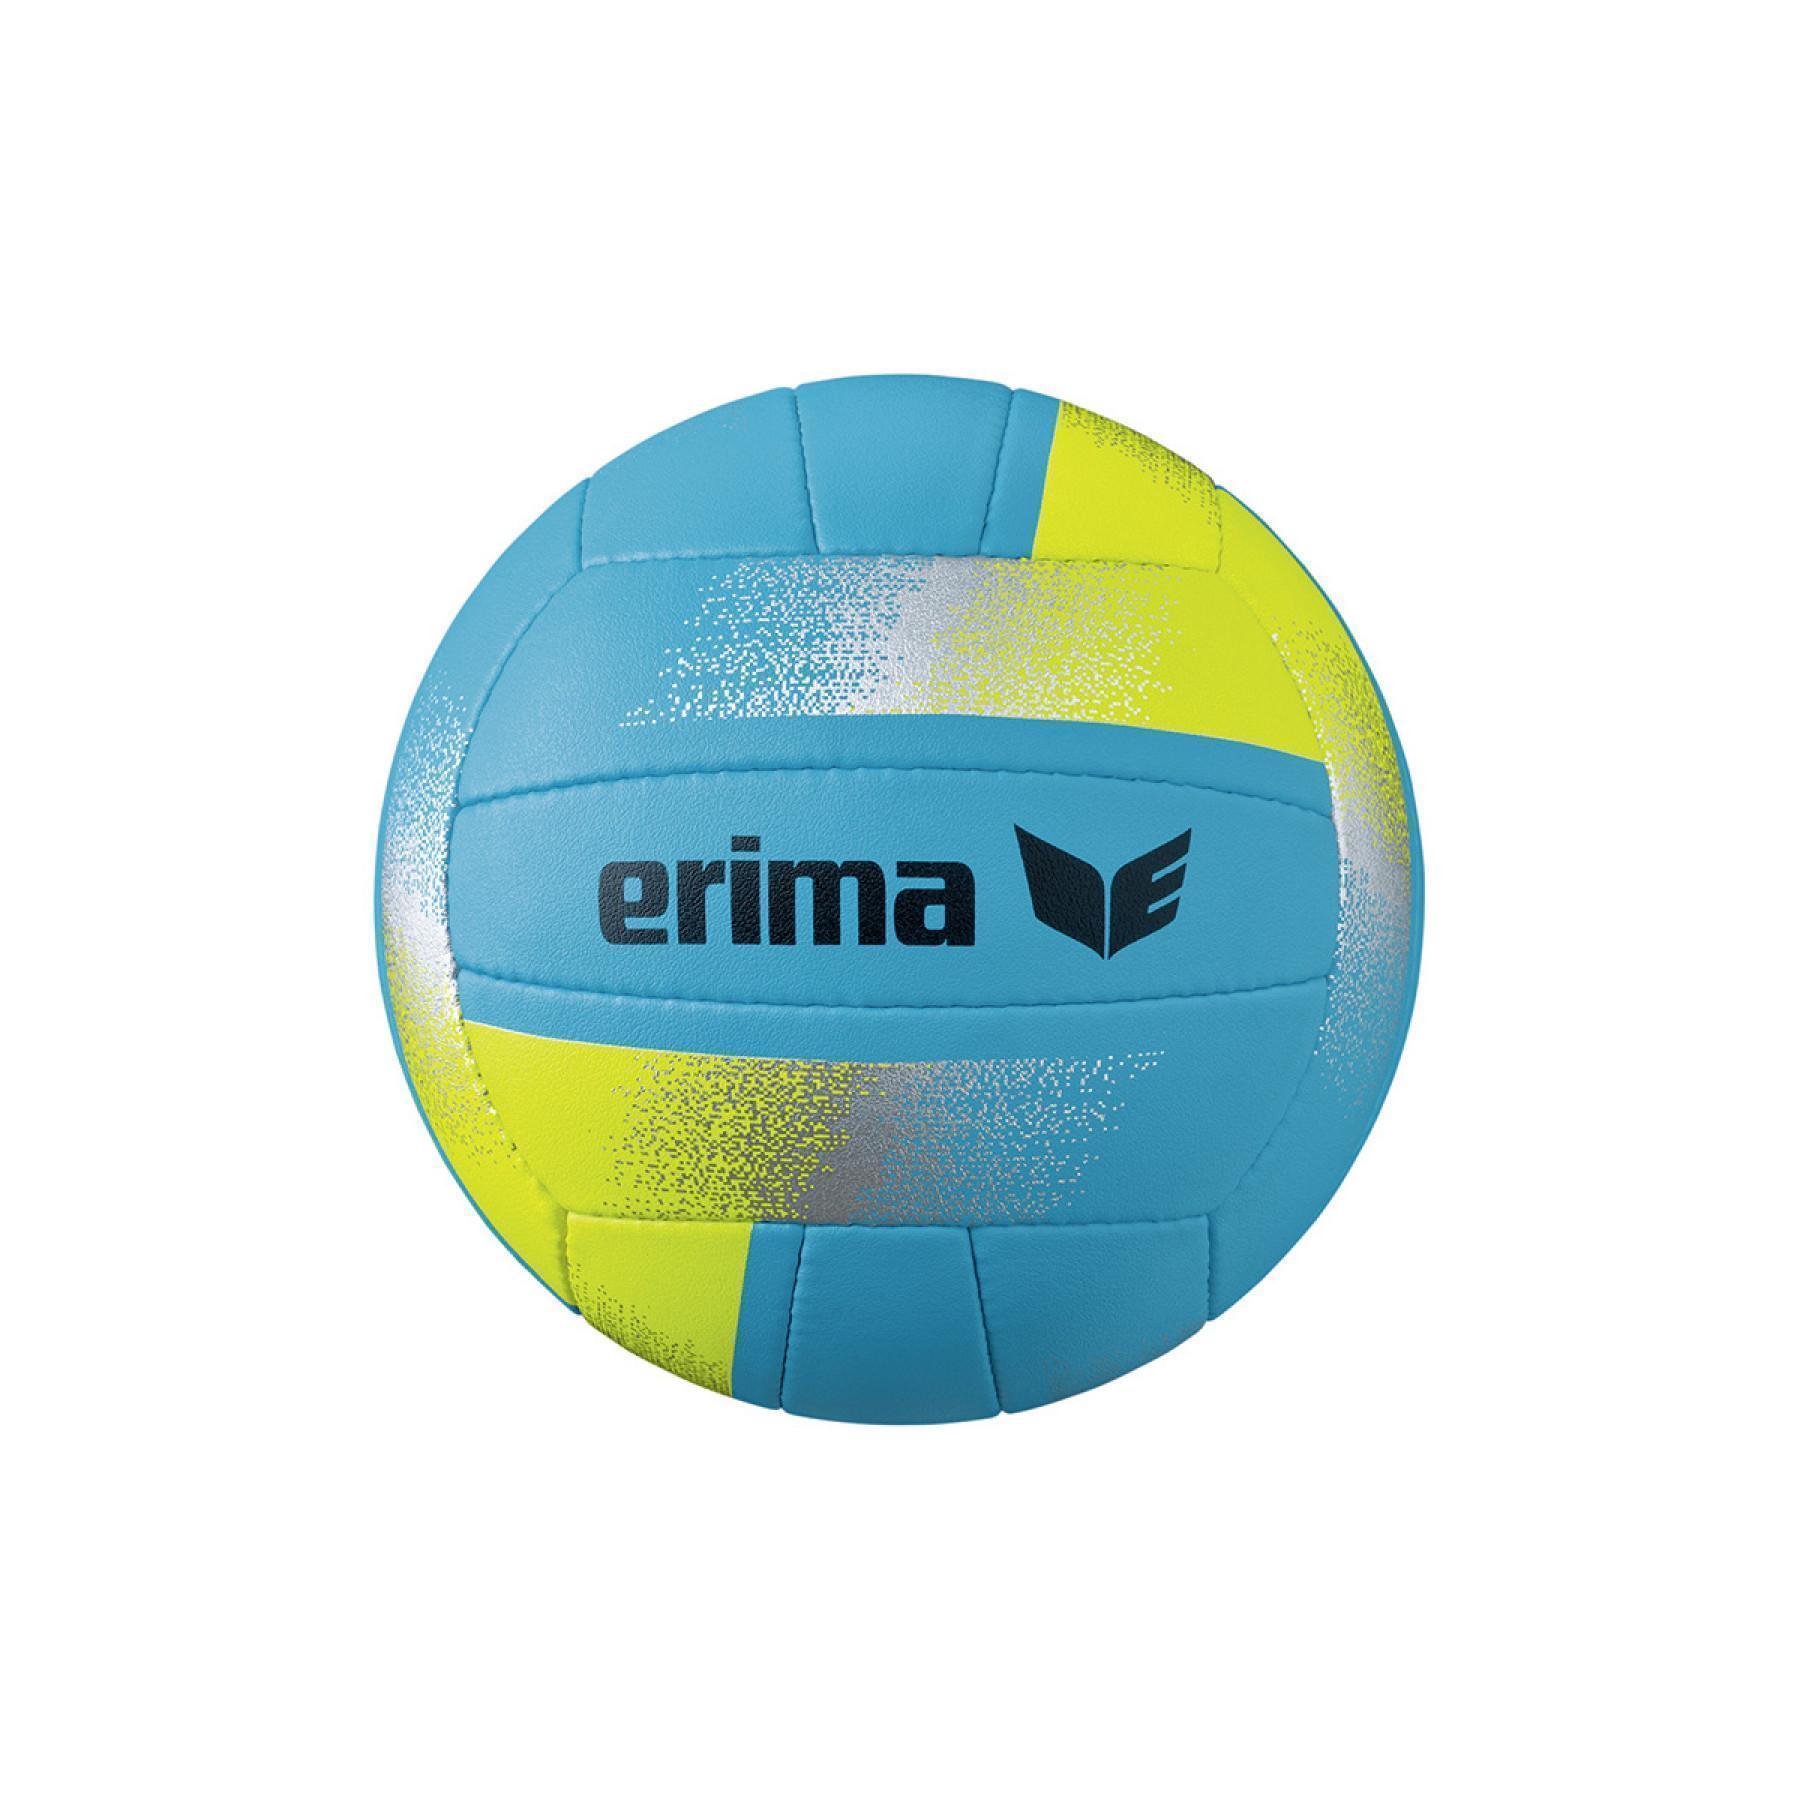 Erima Ball King of the beach T5